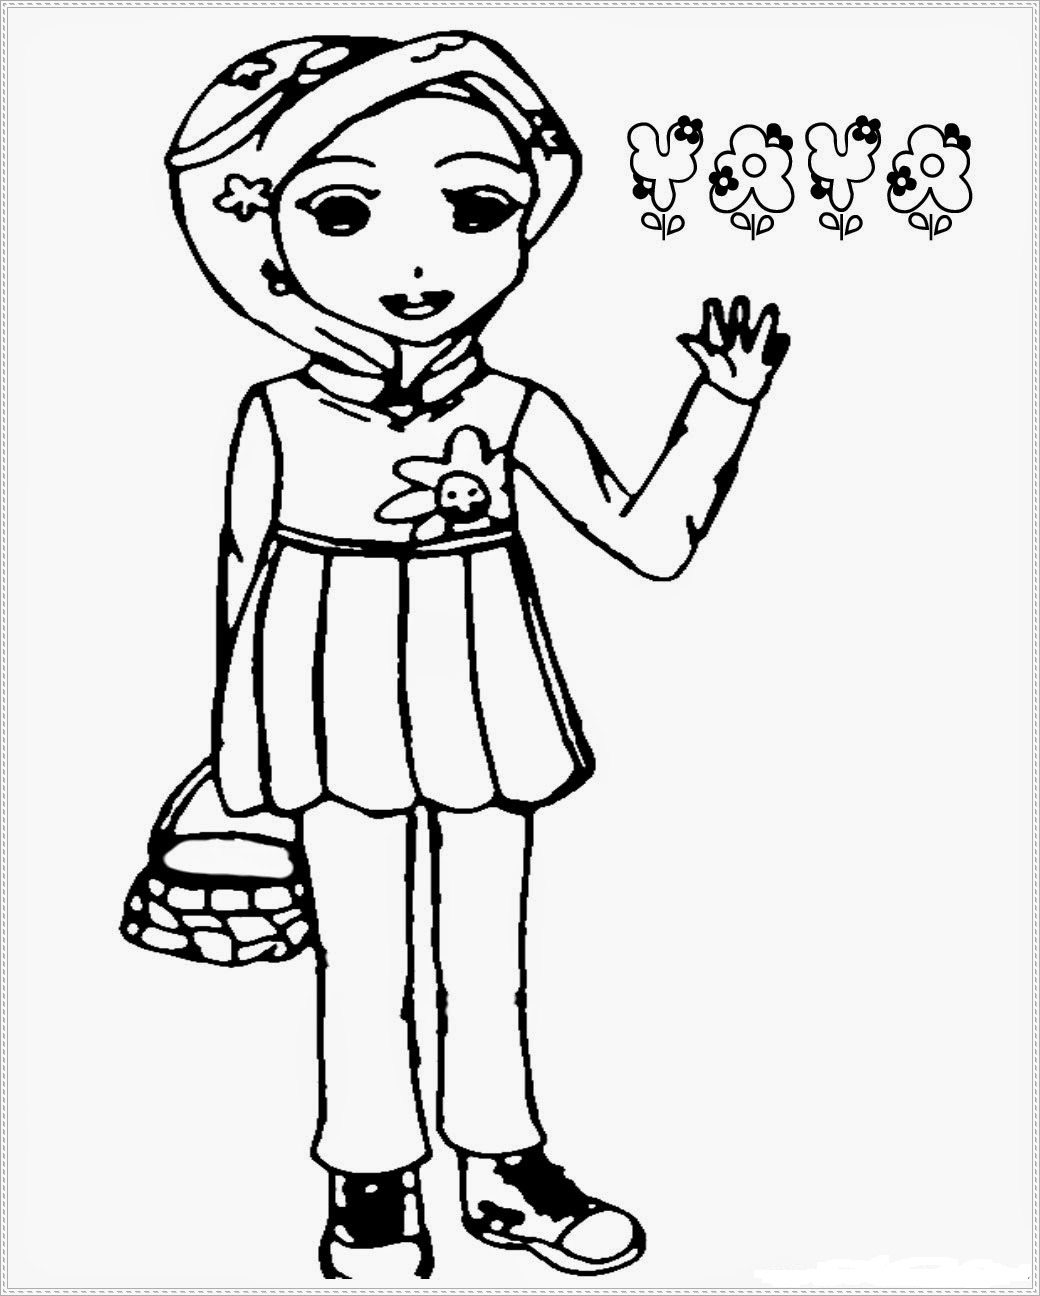 Mewarnai Gambar Kartun Hitam Putih Boboboi Wwwtollebildcom